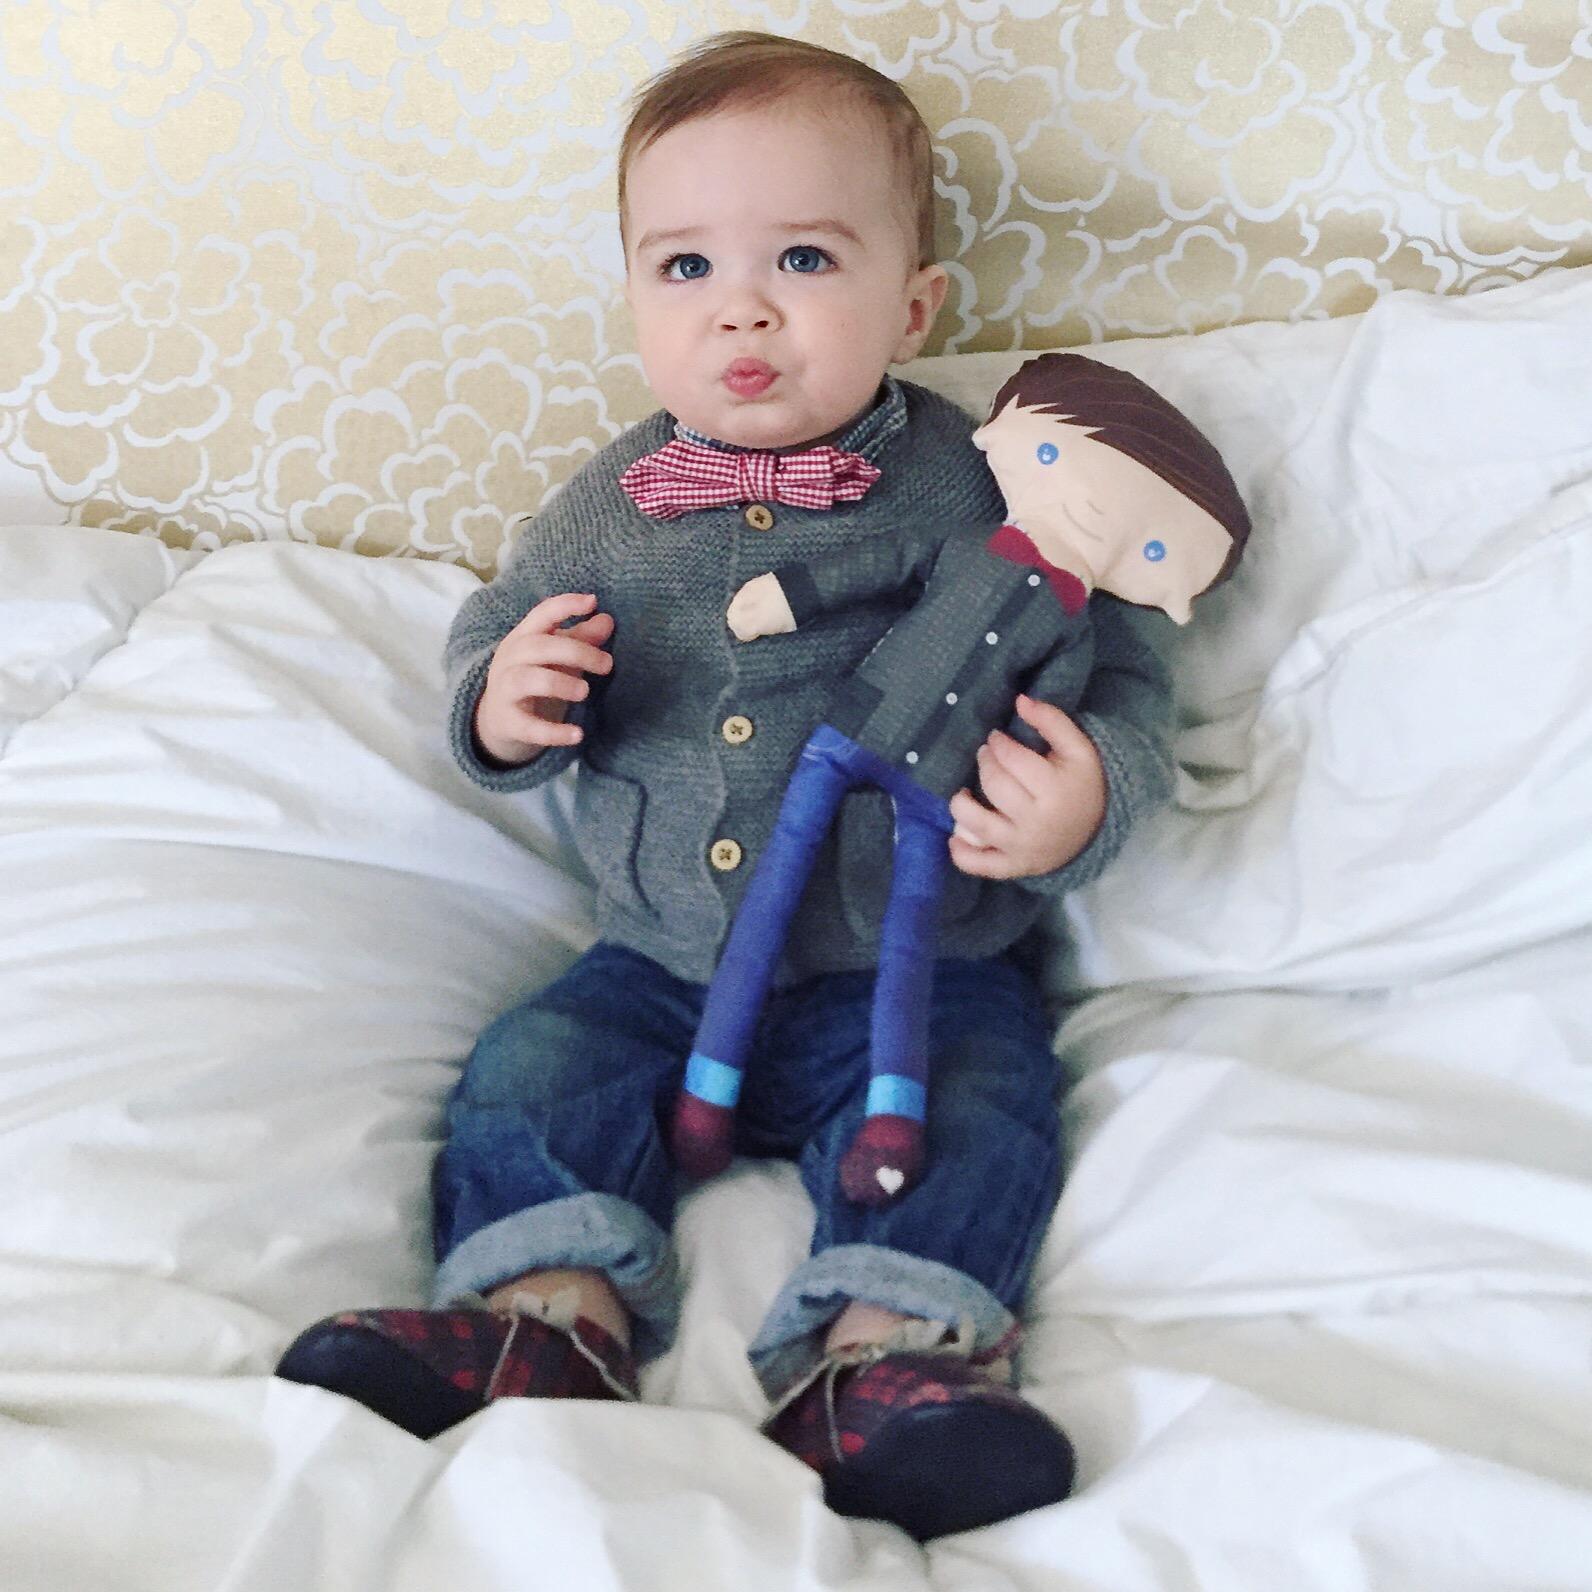 Personalized Handmade Baby Dolls from Etsy   #mrbrodyparker   Momma Society-The Community of Modern Moms